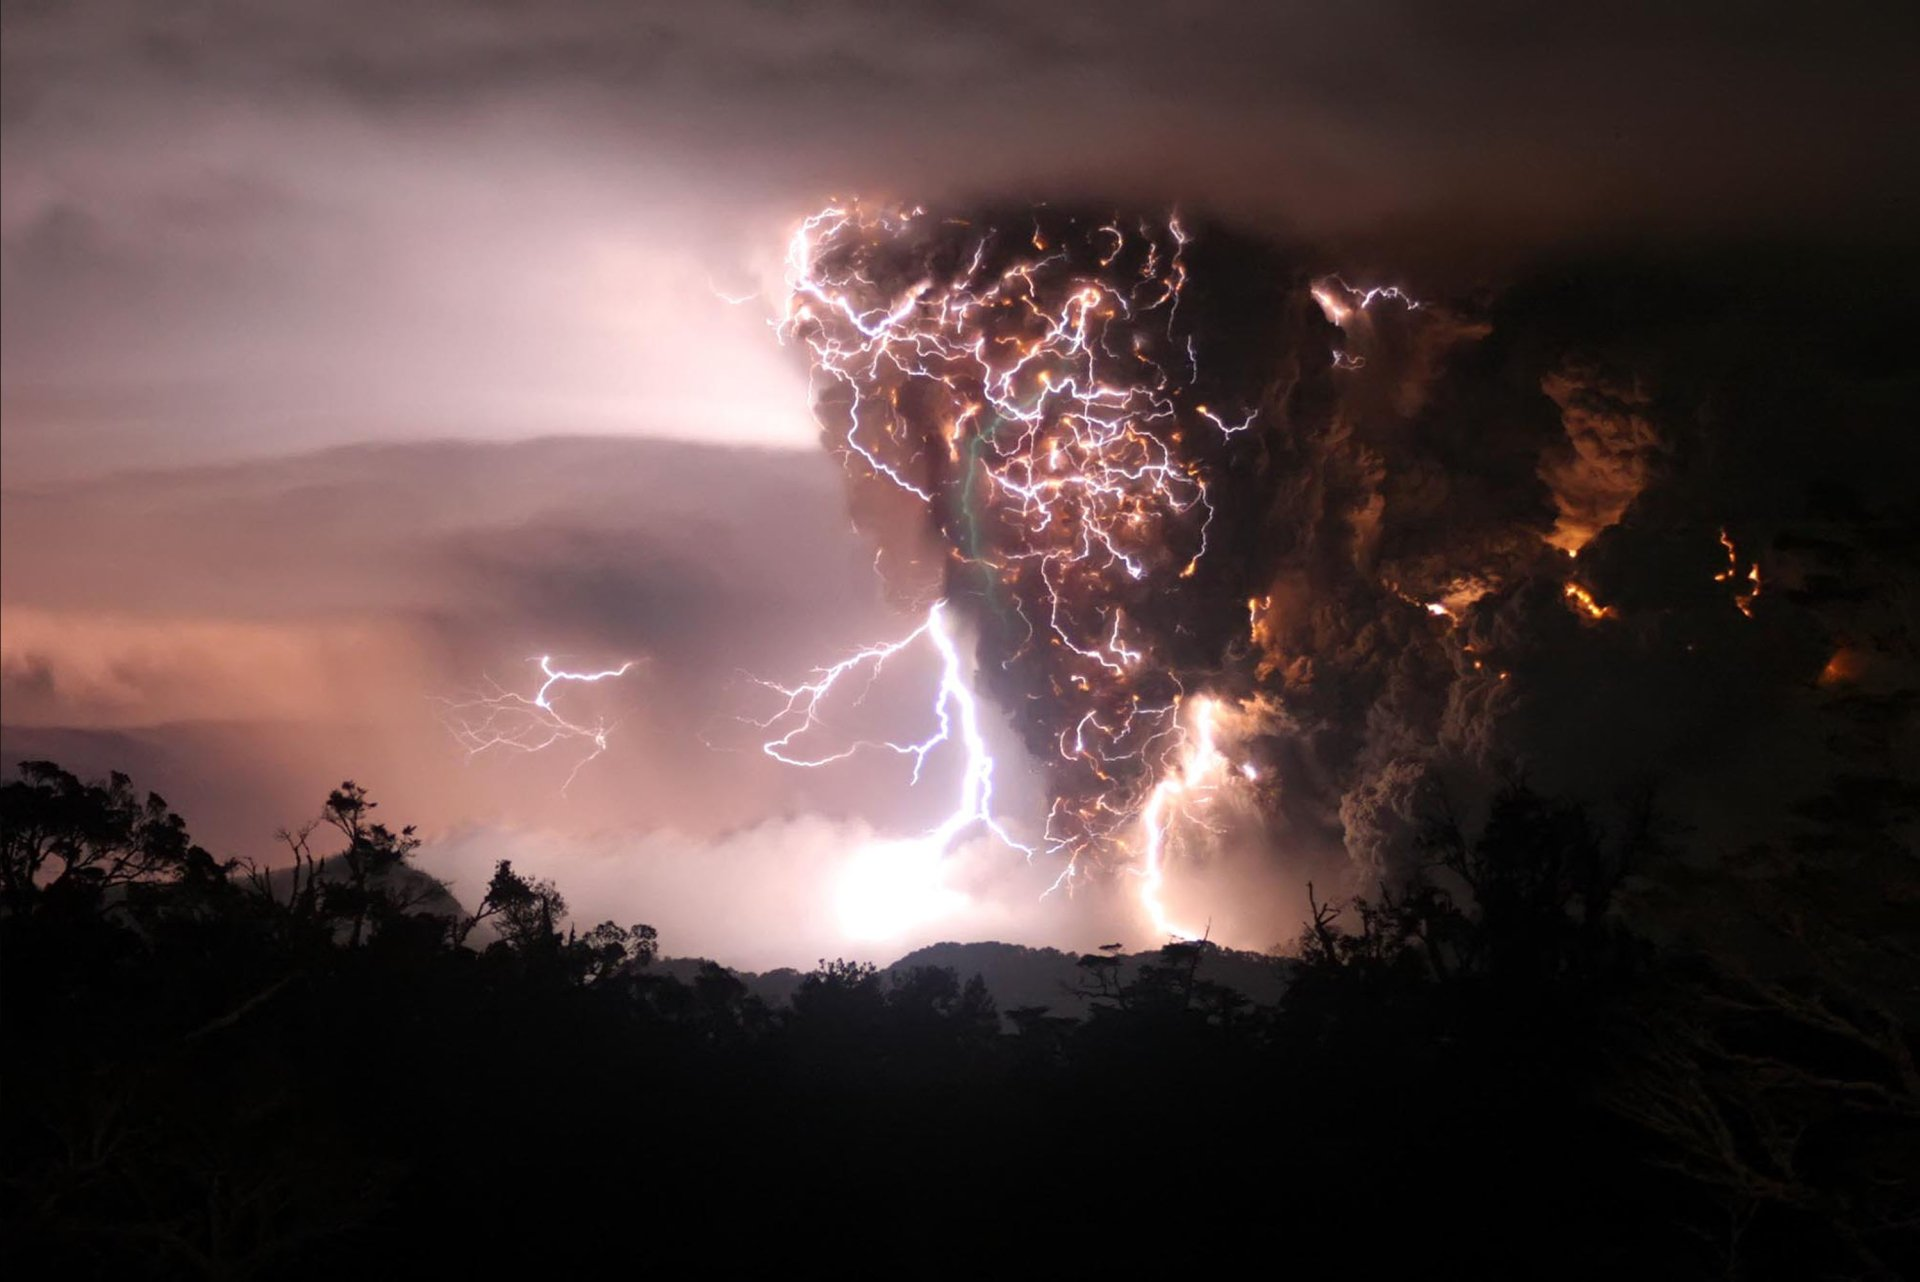 Fotografie - Bliksem  Vulkaan Wallpaper